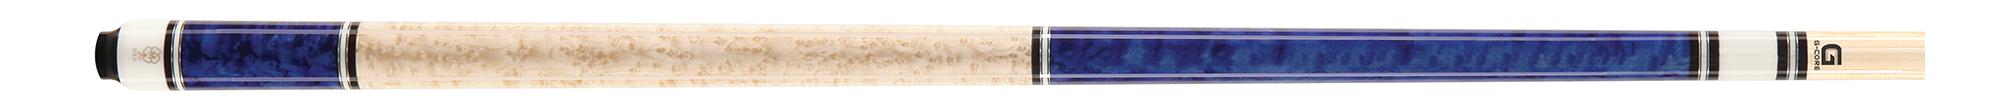 PK3019: McDermott G230 Pacific Blue pool Gewicht: 19Oz #1